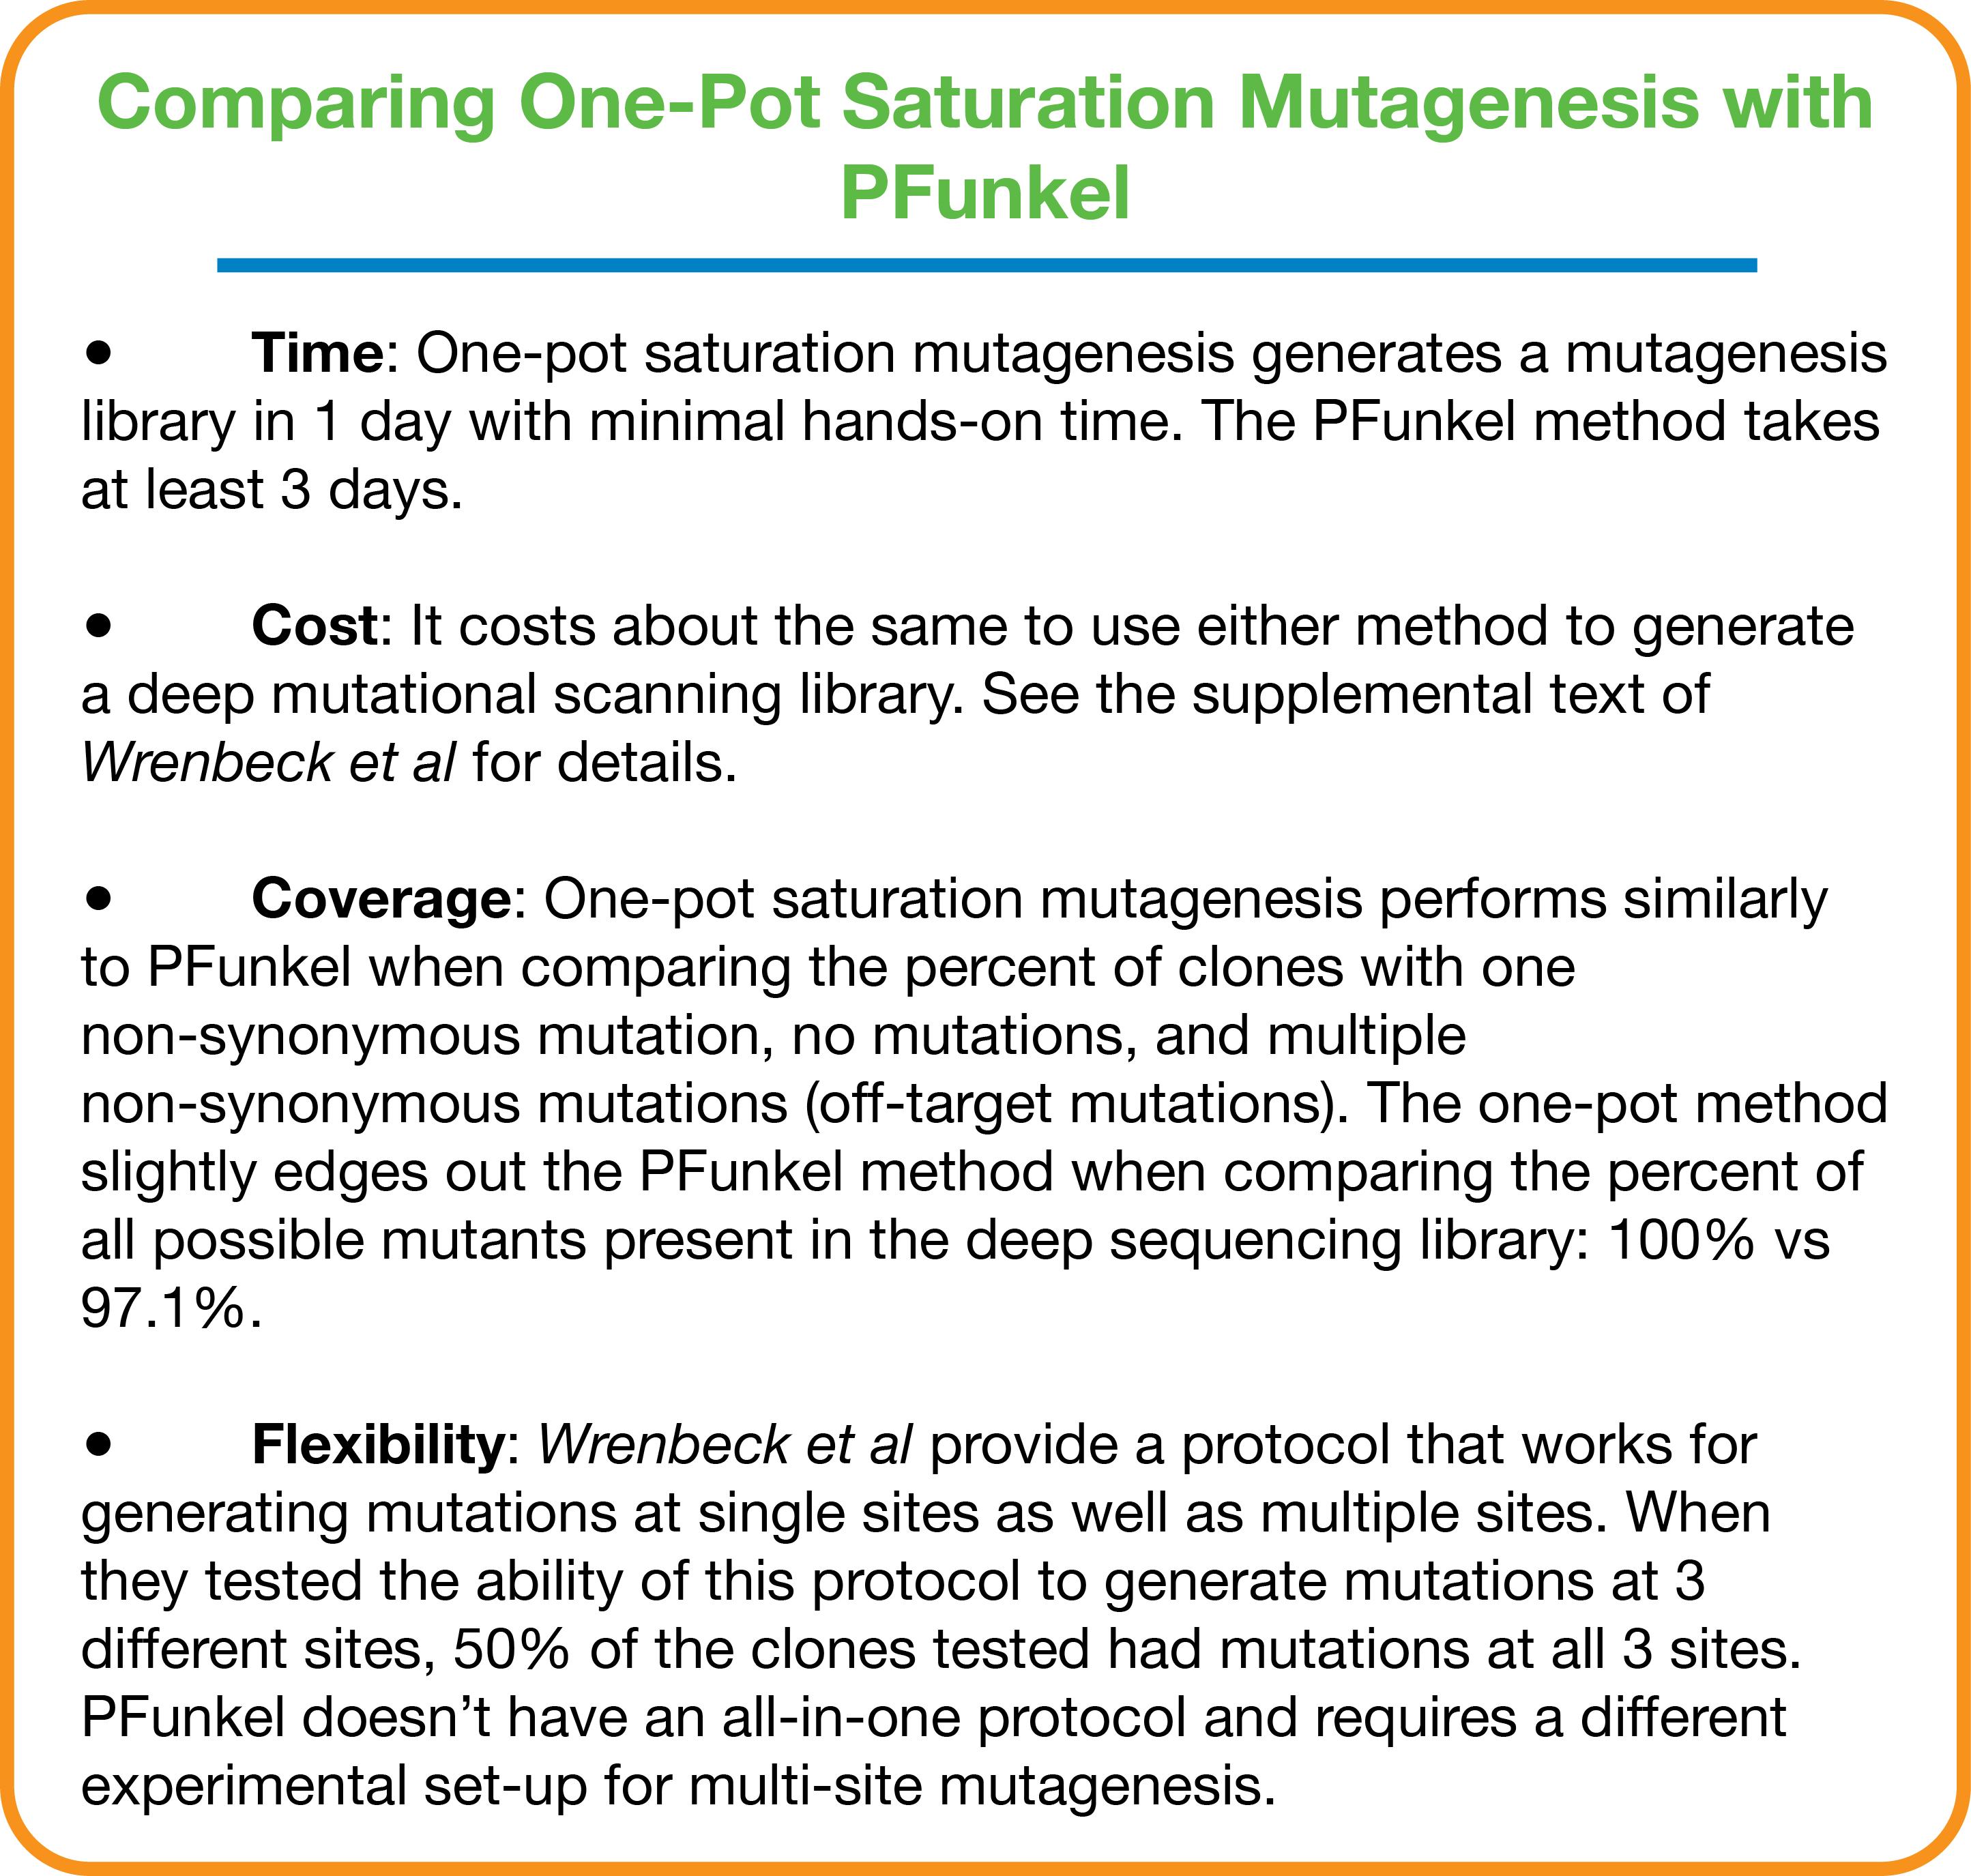 One Pot Saturation Mutagenesis v pFunkel